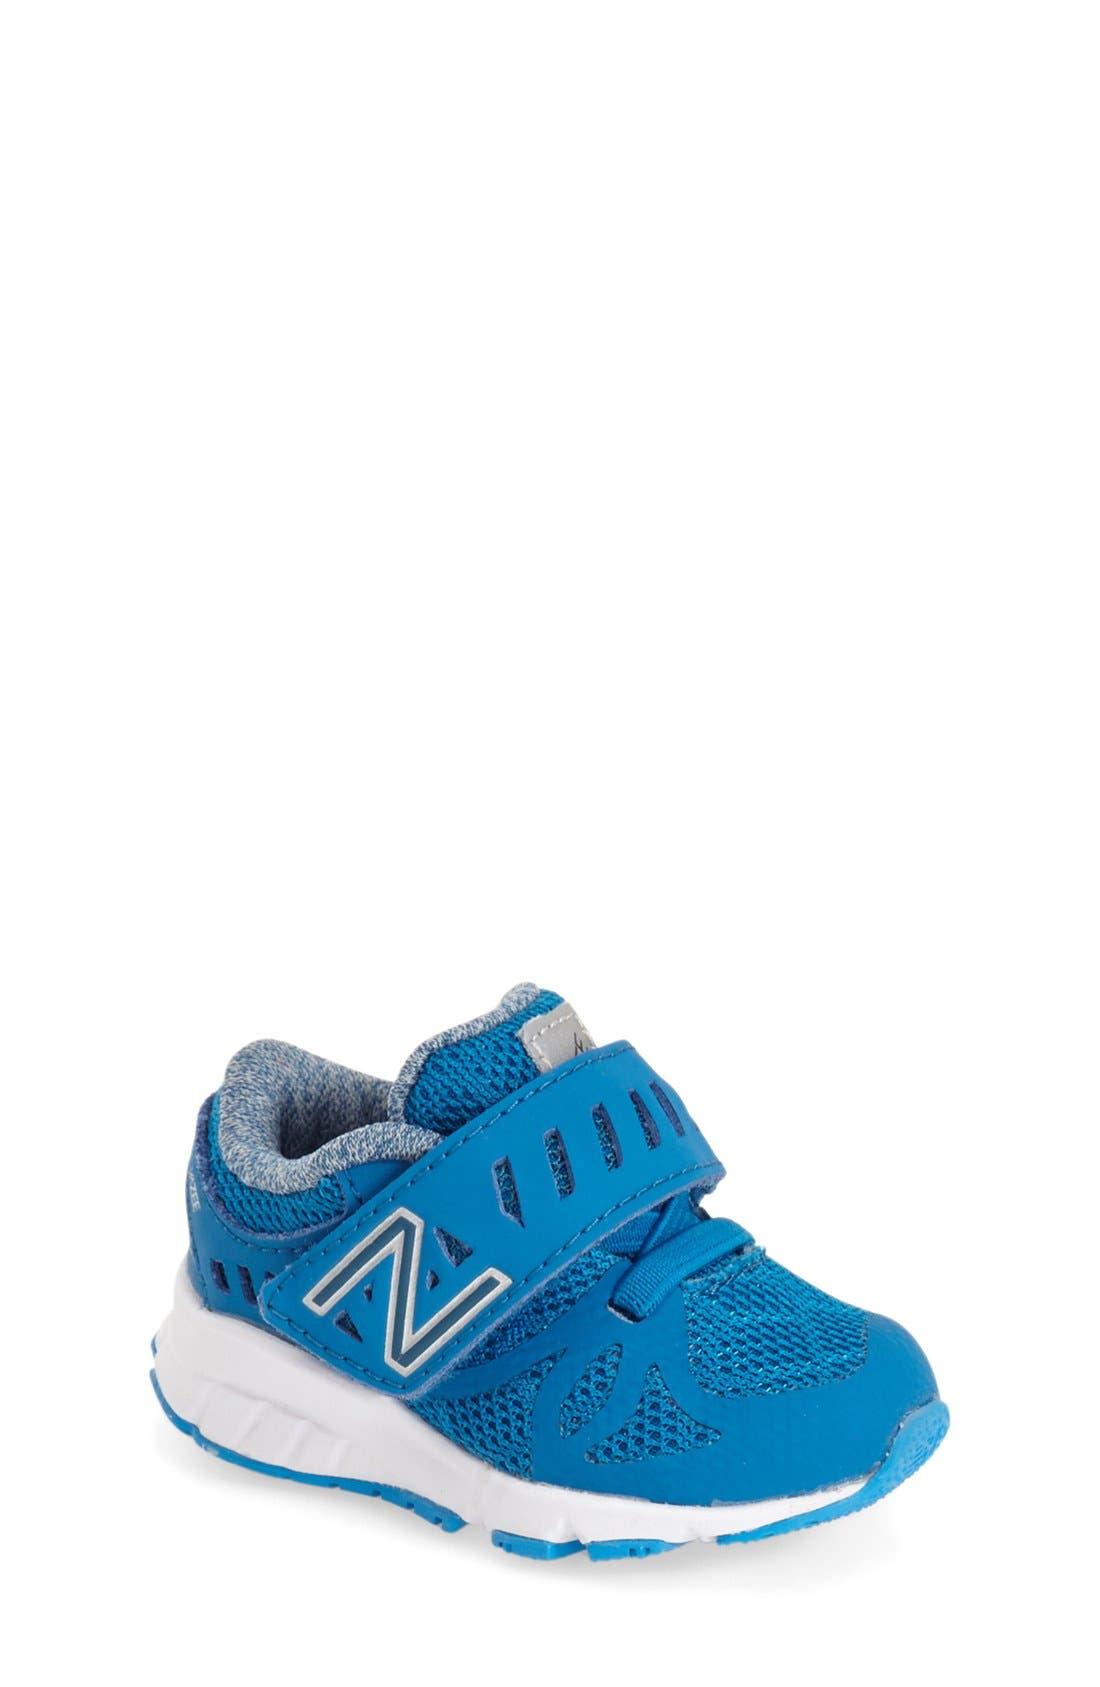 'Vazee Rush 200' Athletic Shoe,                             Main thumbnail 2, color,